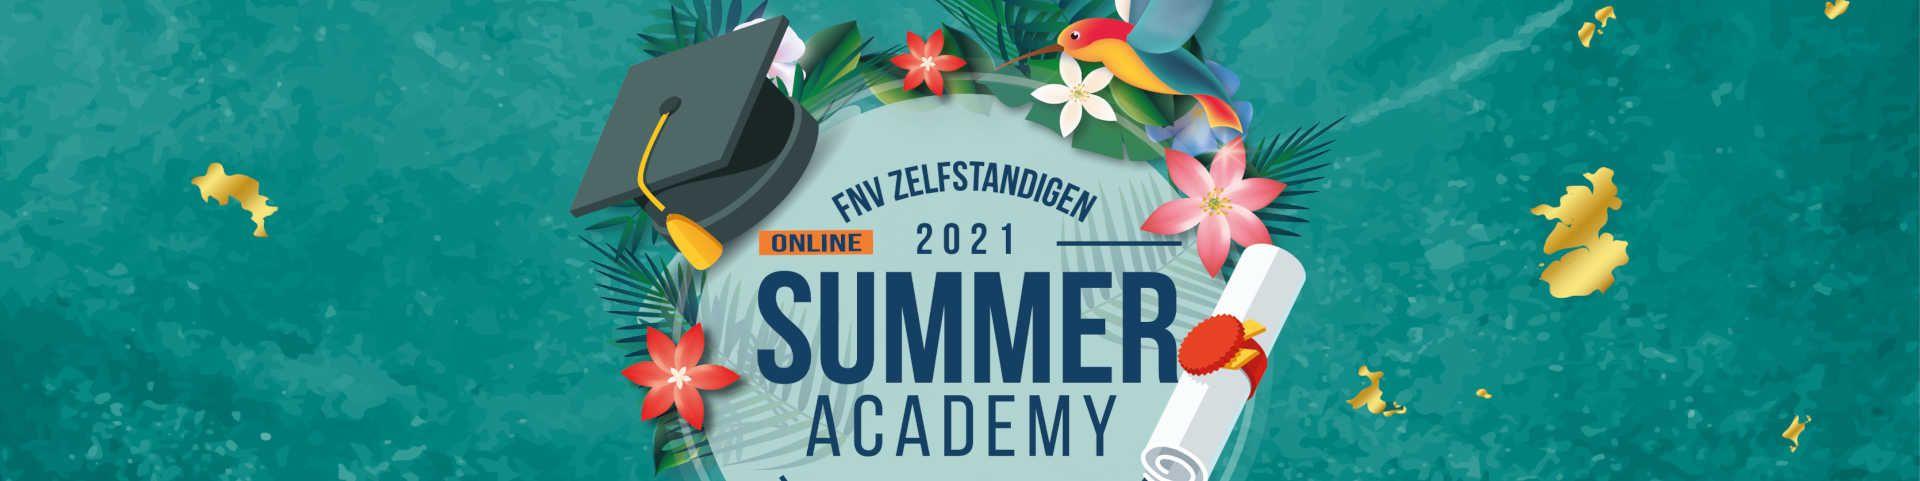 Summer Academy 1920